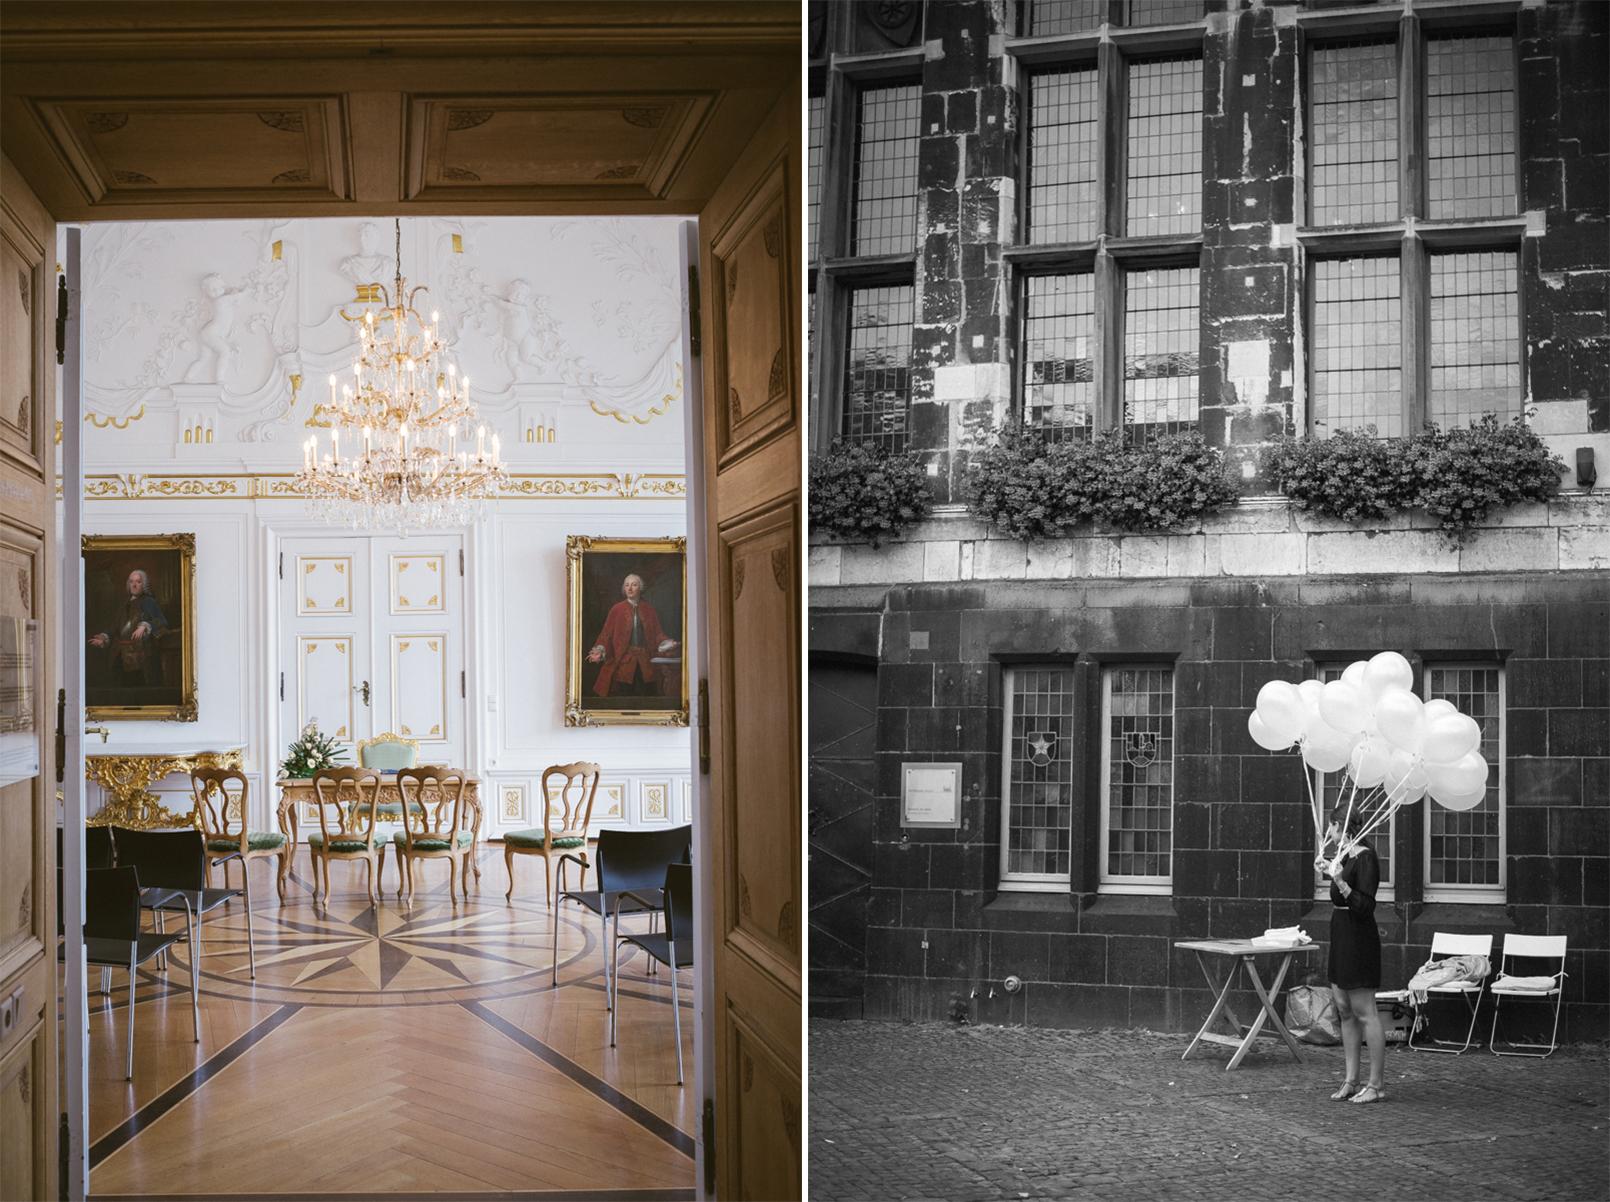 Hochzeitsfotograf-Fotografie-Aachen-Lua-Pauline-Dreamcatcher-0010